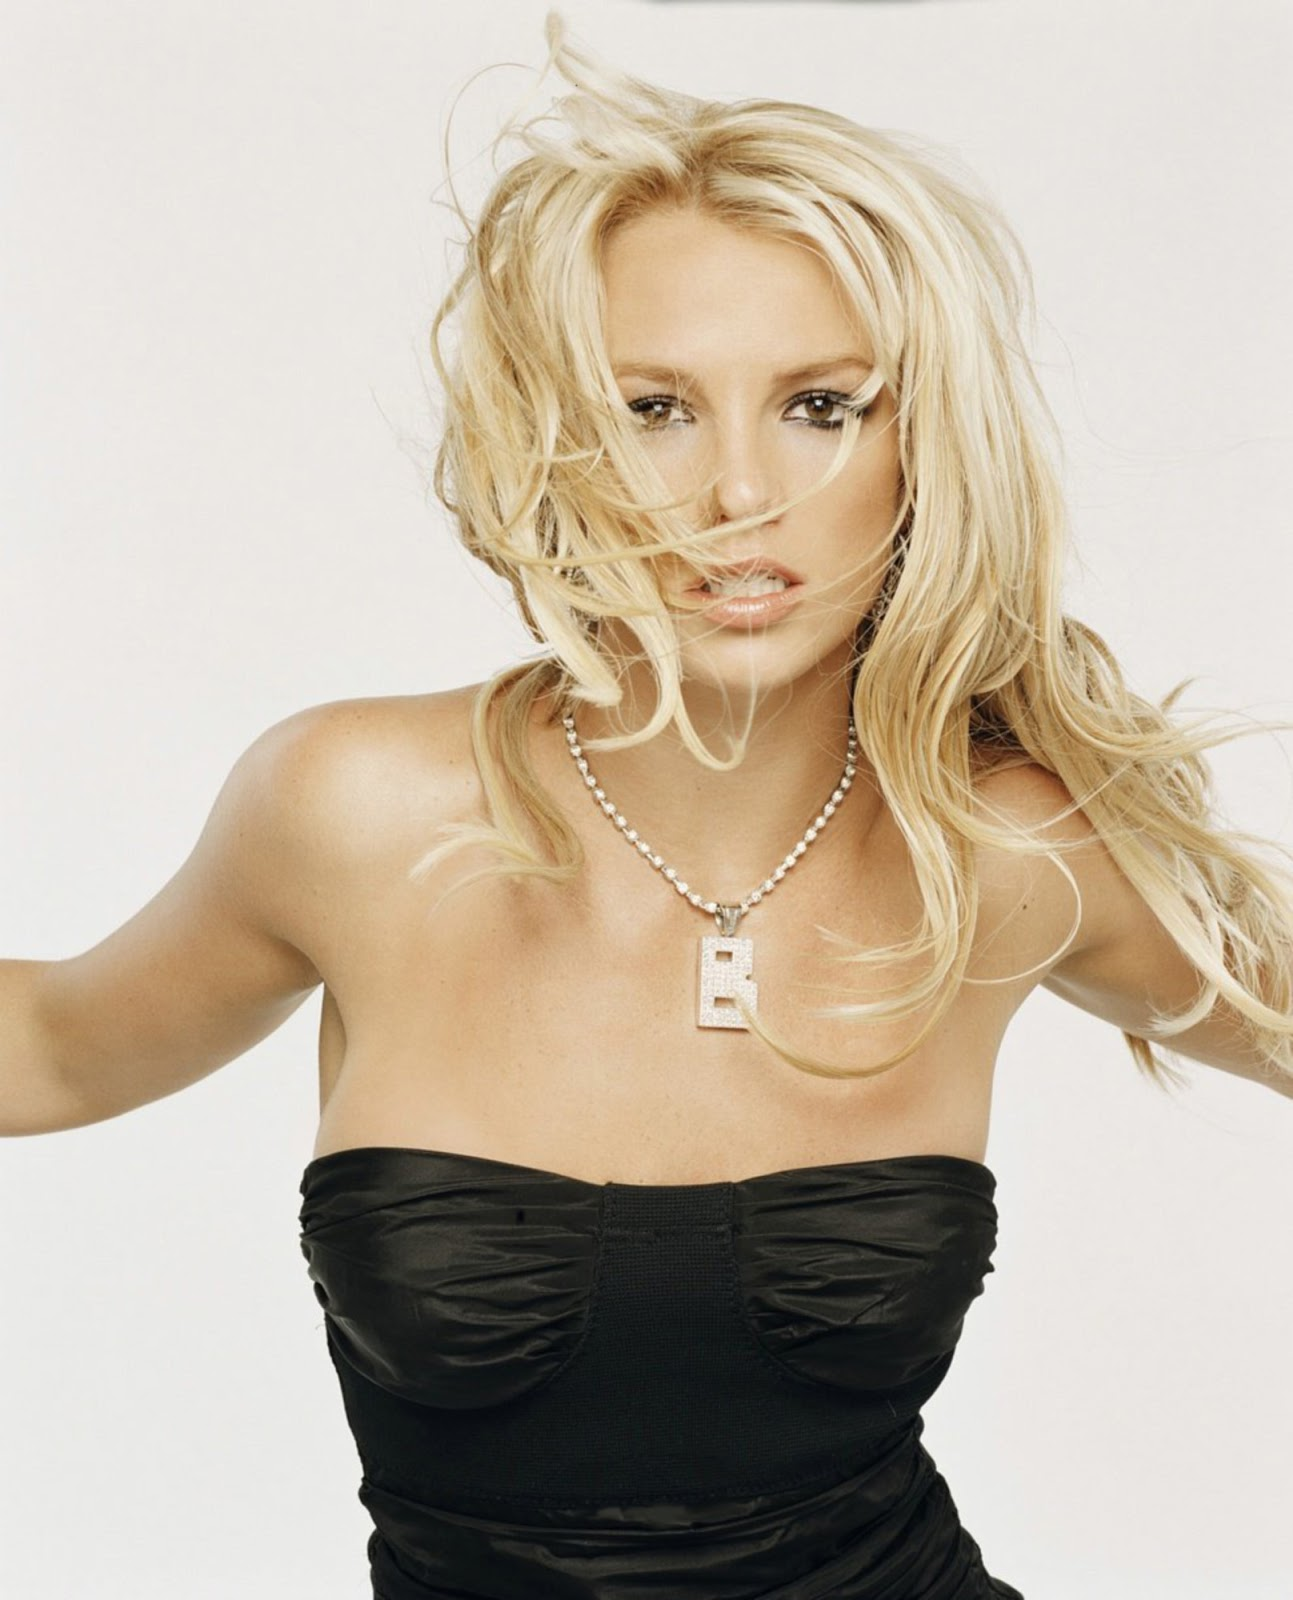 britney, Spears, Singer, Pop, Dance, Electropop, Sexy